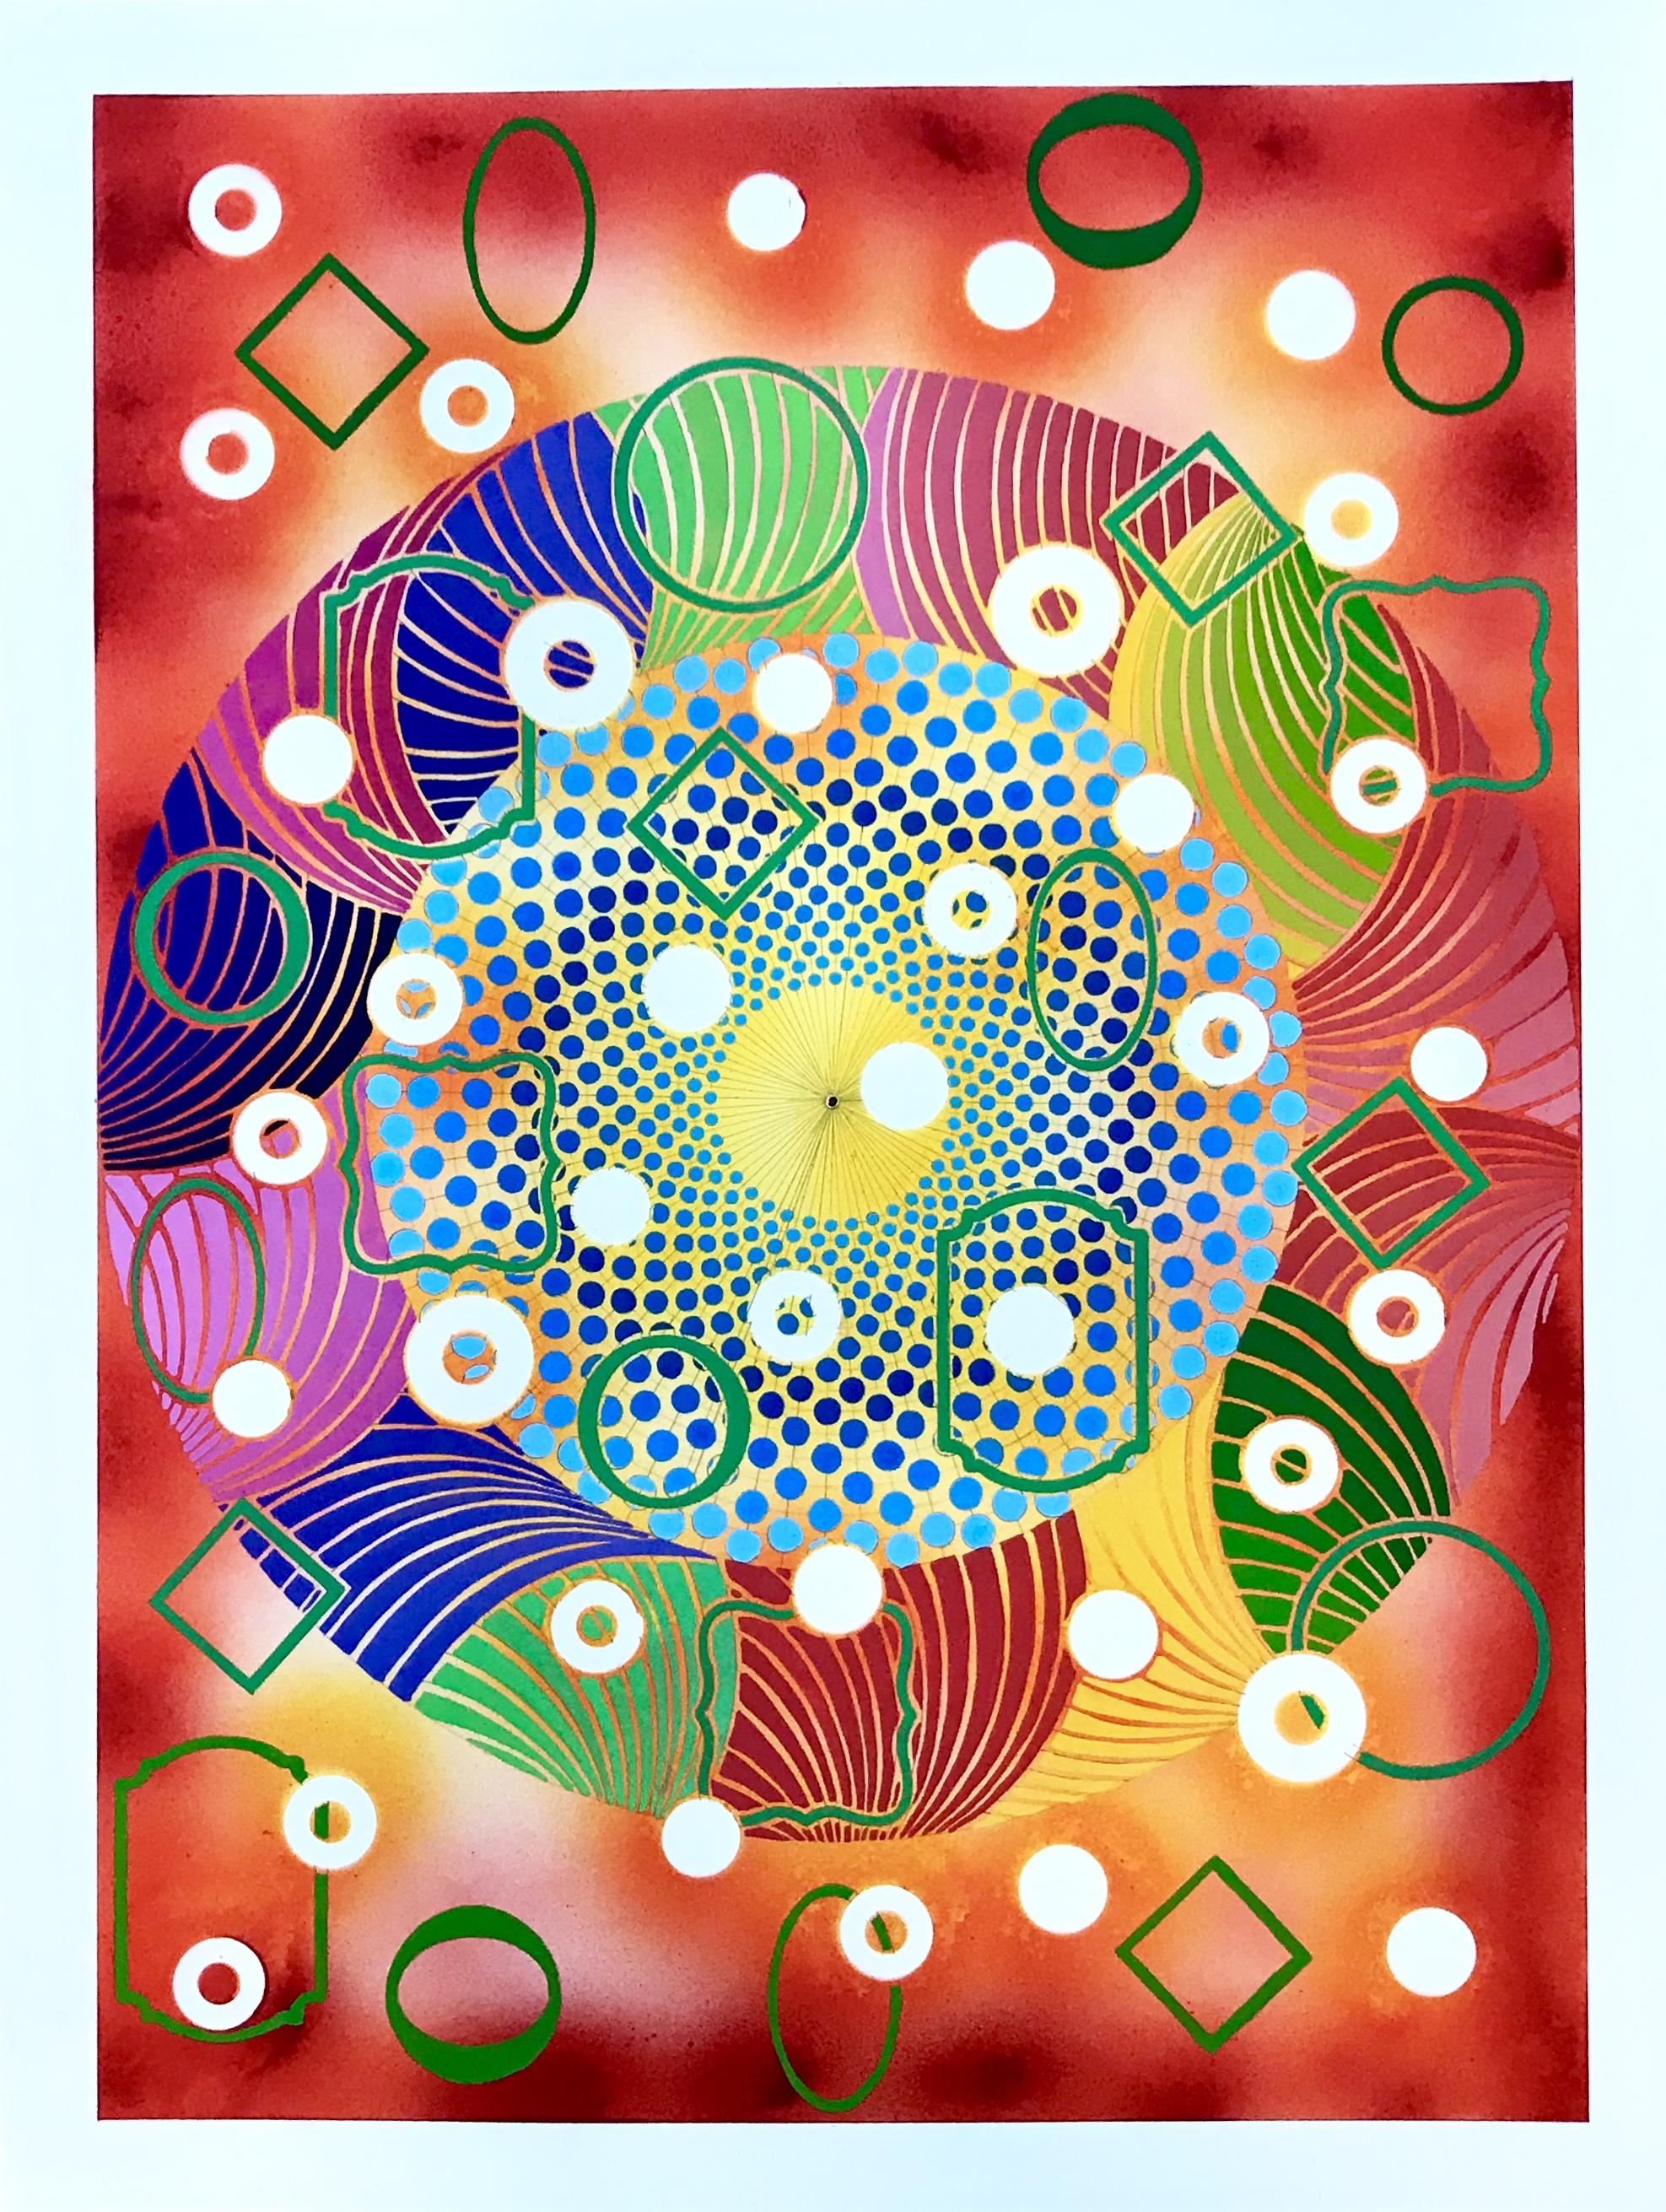 Midheaven, 2019, watercolor, 18 x 24 in, $1,500